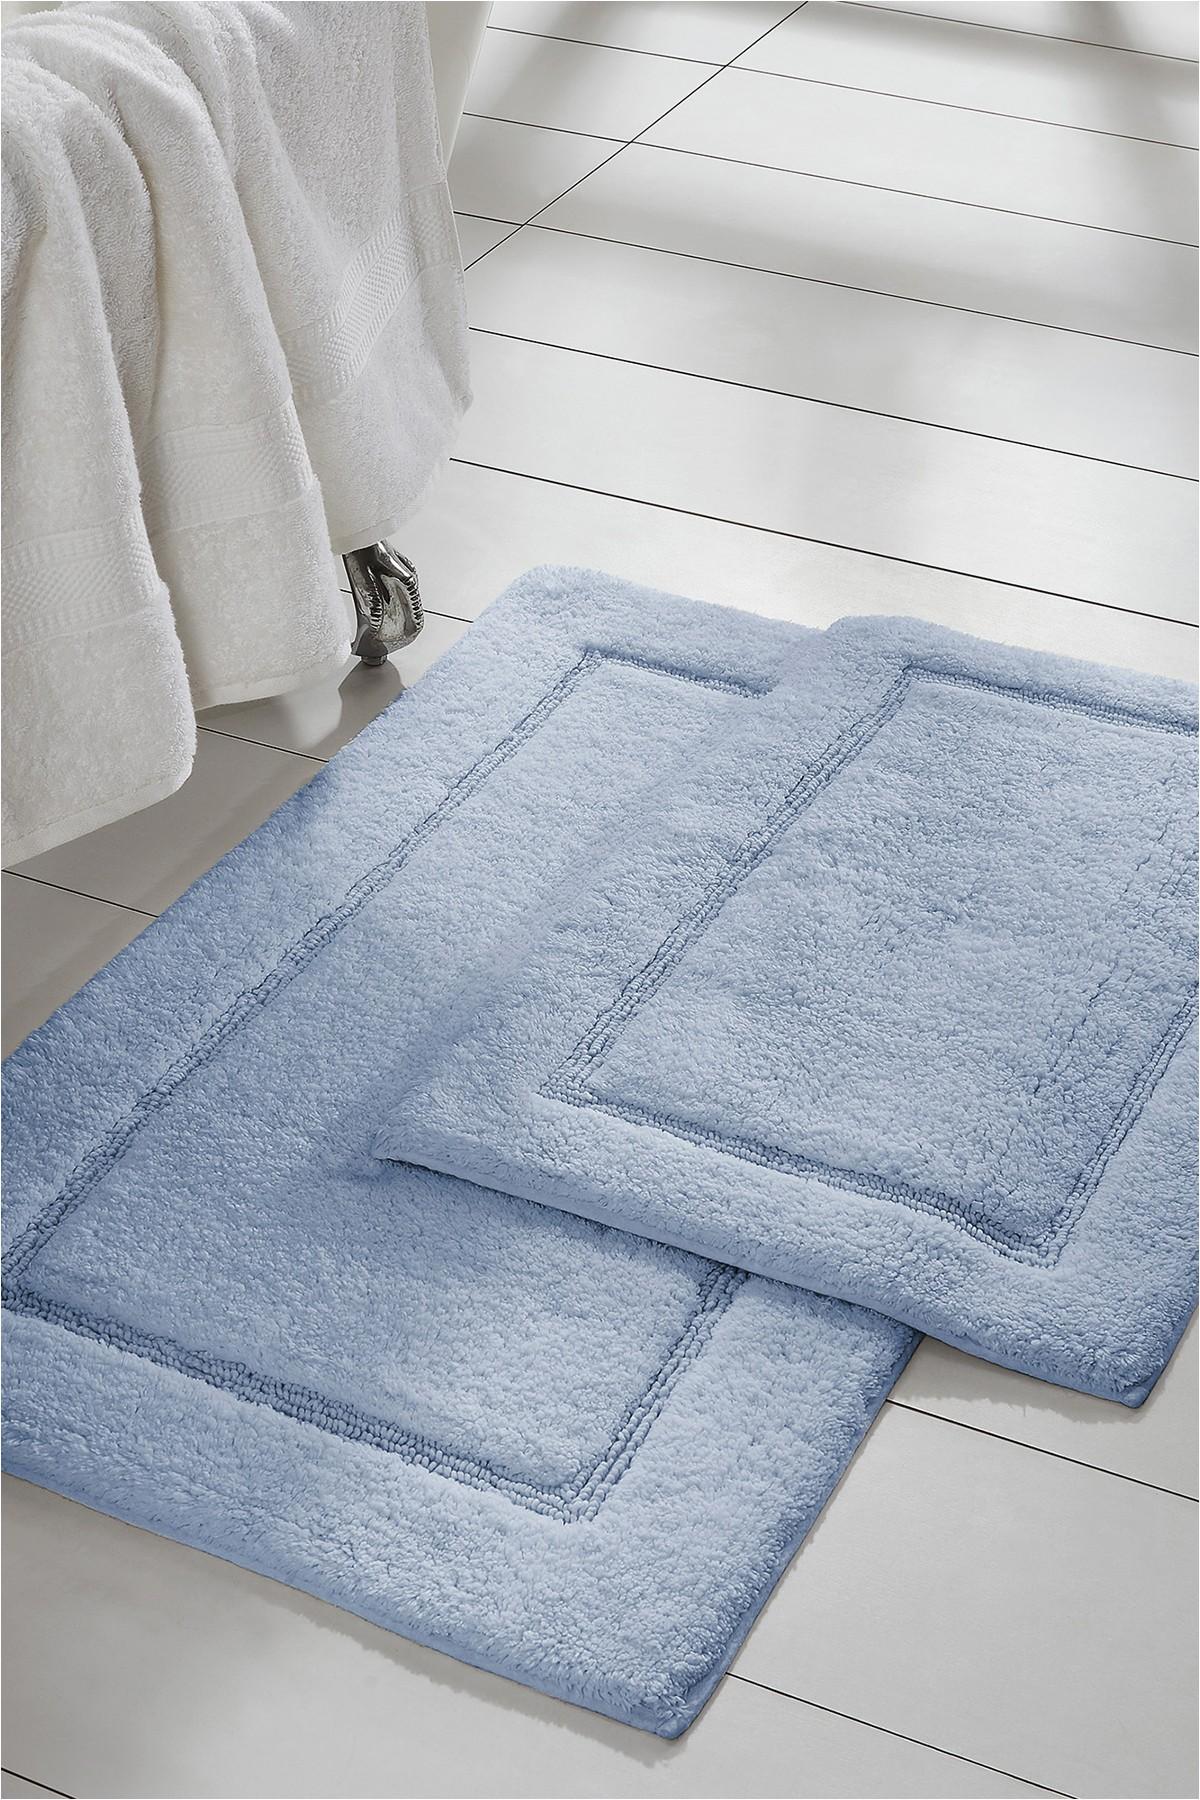 Baby Blue Bath Rug Modern Threads Light Blue solid Loop Non Slip Bath Mat 2 Piece Set